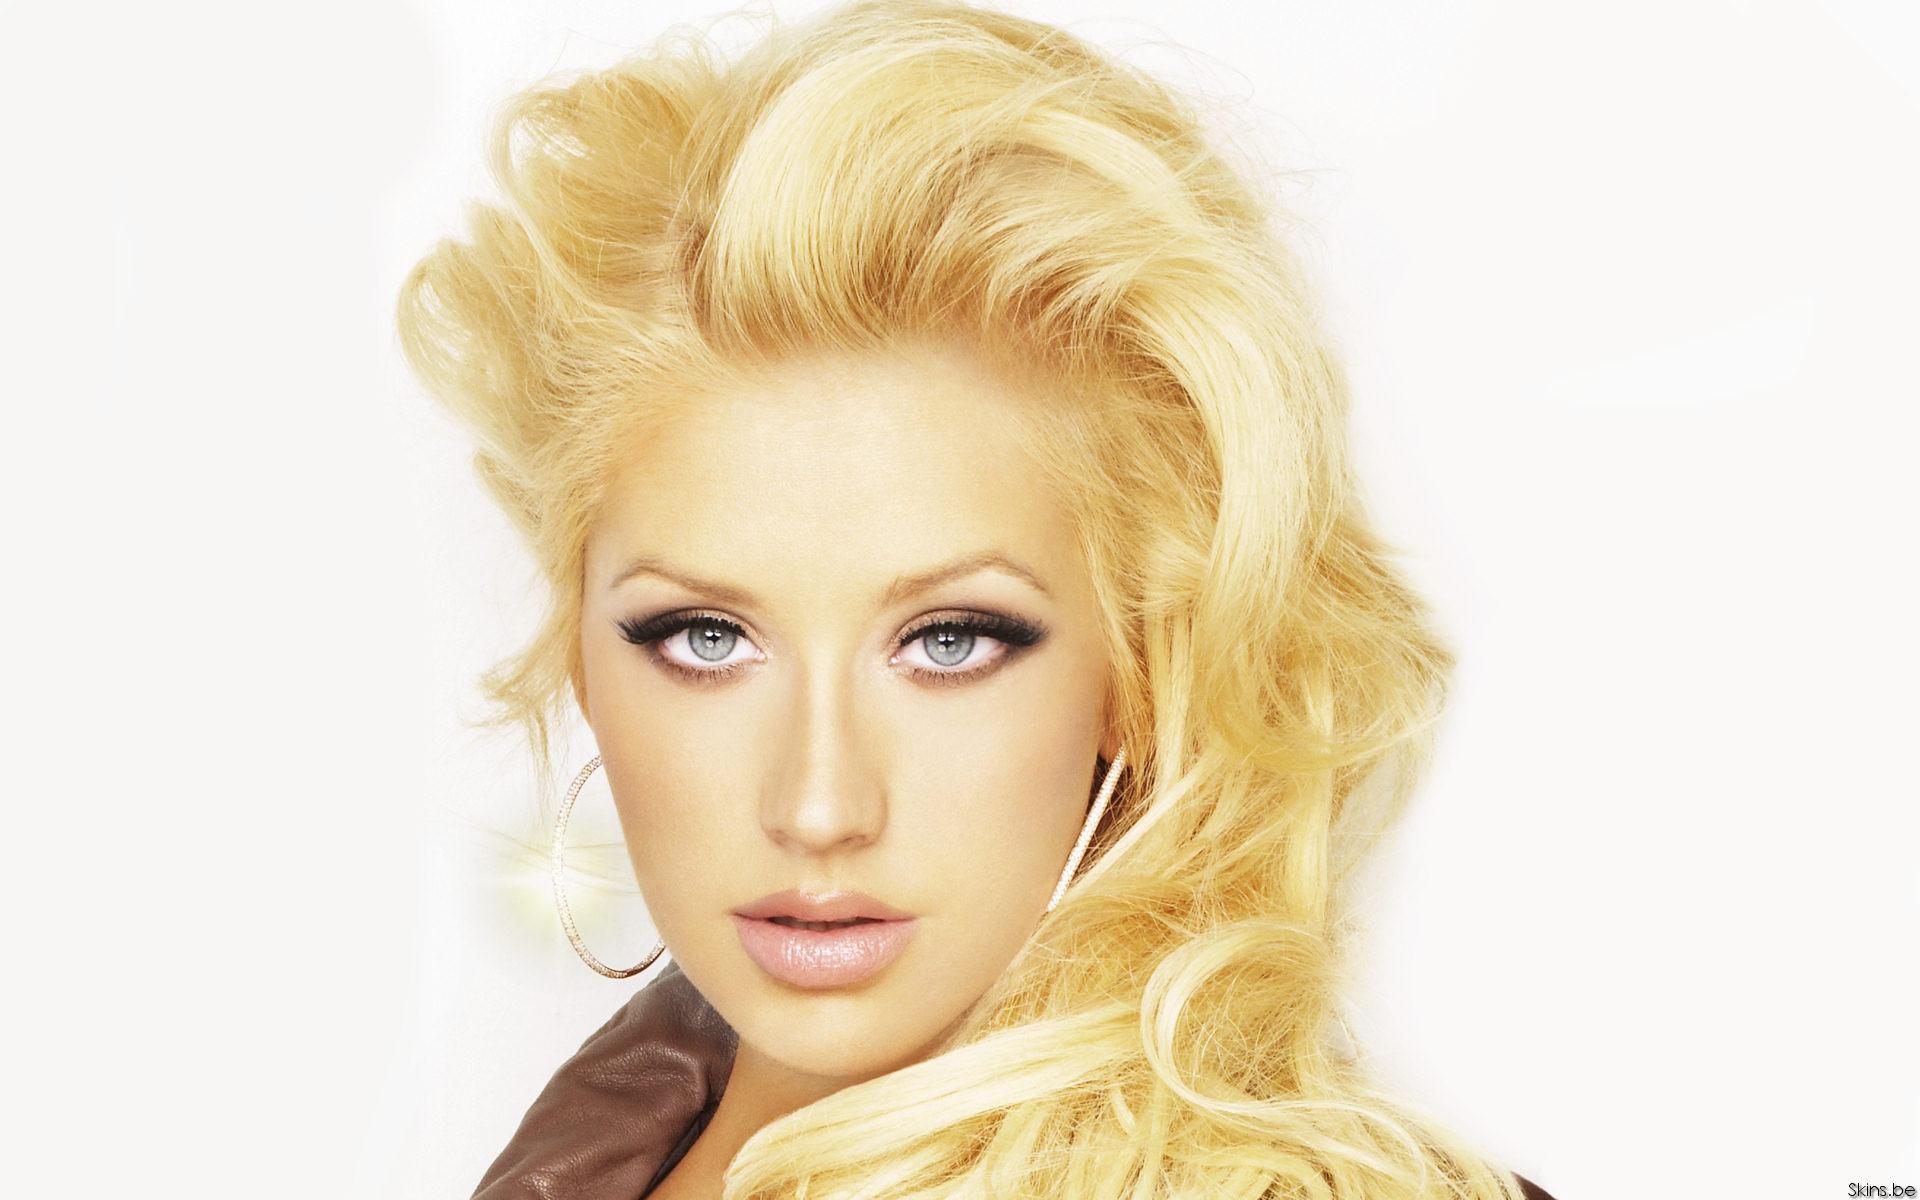 Christina Aguilera Beautiful HD Wallpaper 1920x1200